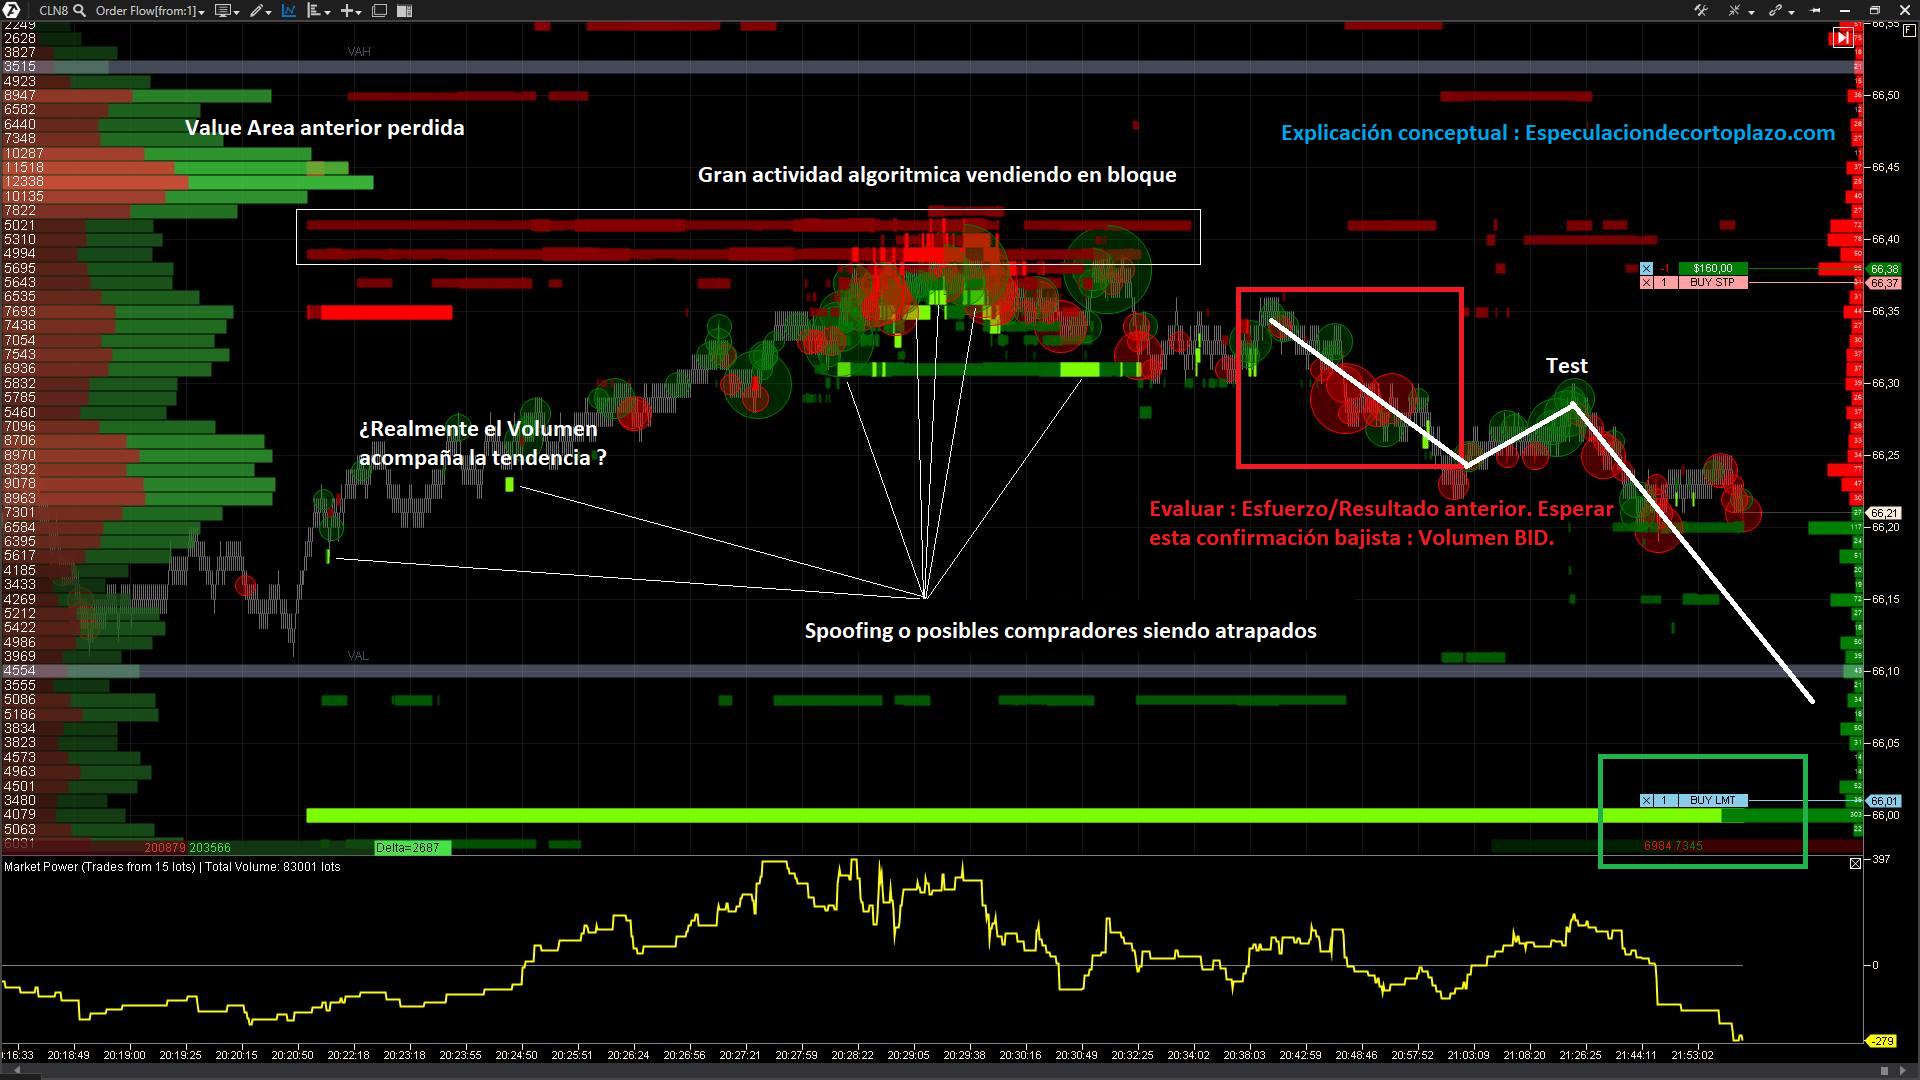 Order Flow Trading - Enric Jaimez